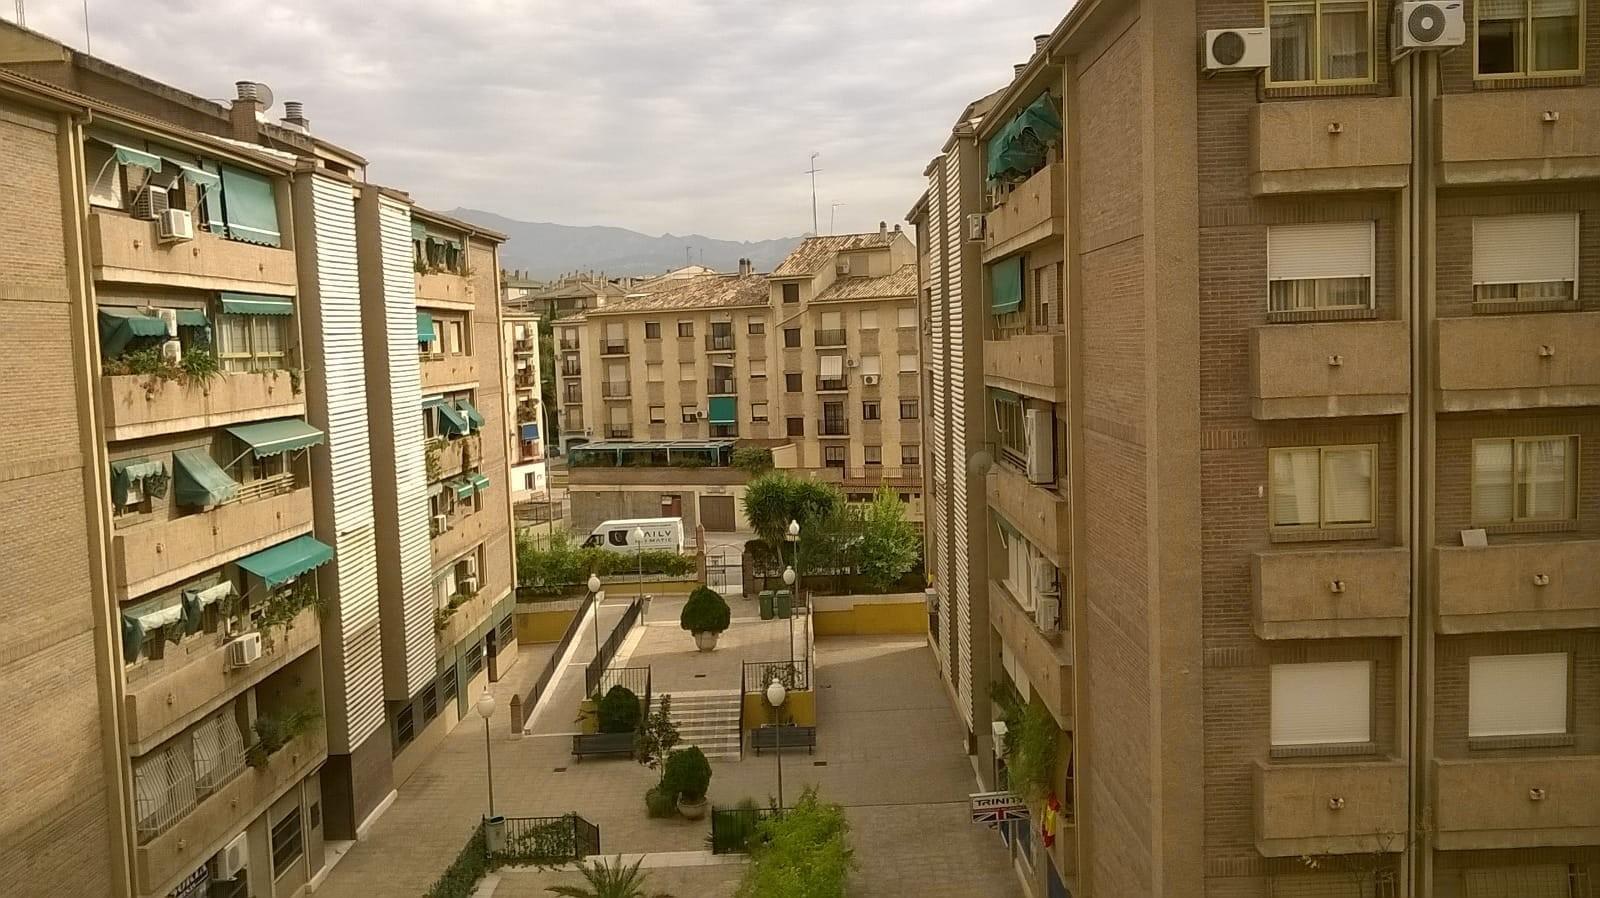 habitacion-amplia-exterior-junto-al-palacio-de-congresos-3432a99742808e094854c8cf6b158f67